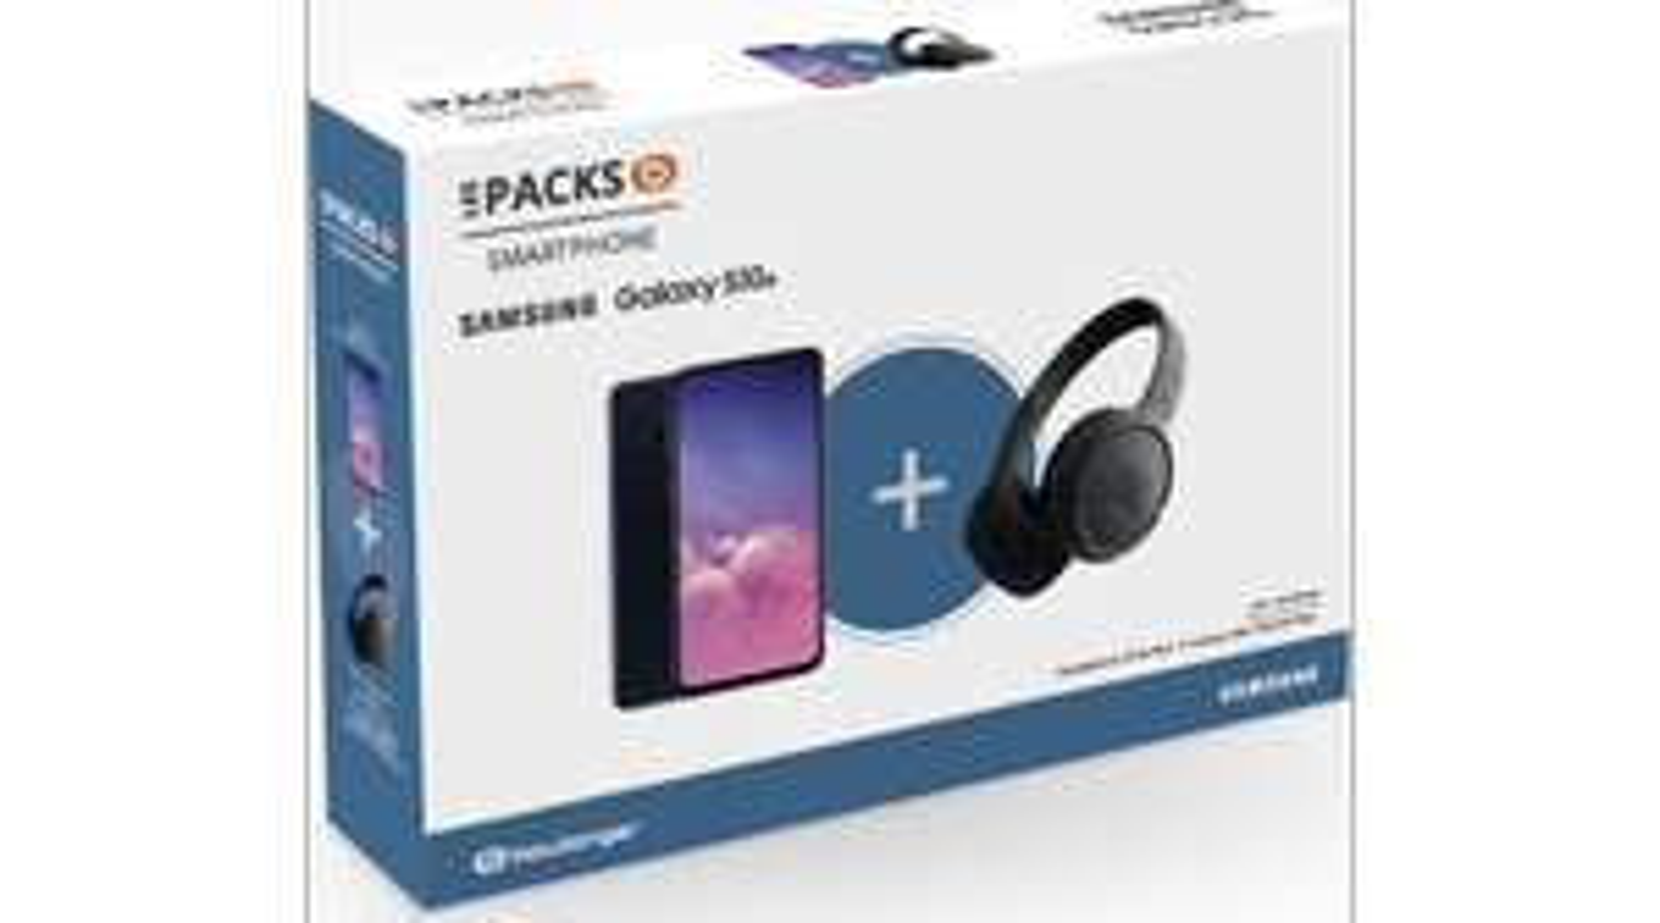 "Smartphone 5.8"" Samsung Galaxy S10e -128Go + Casque JBL T500 BT"